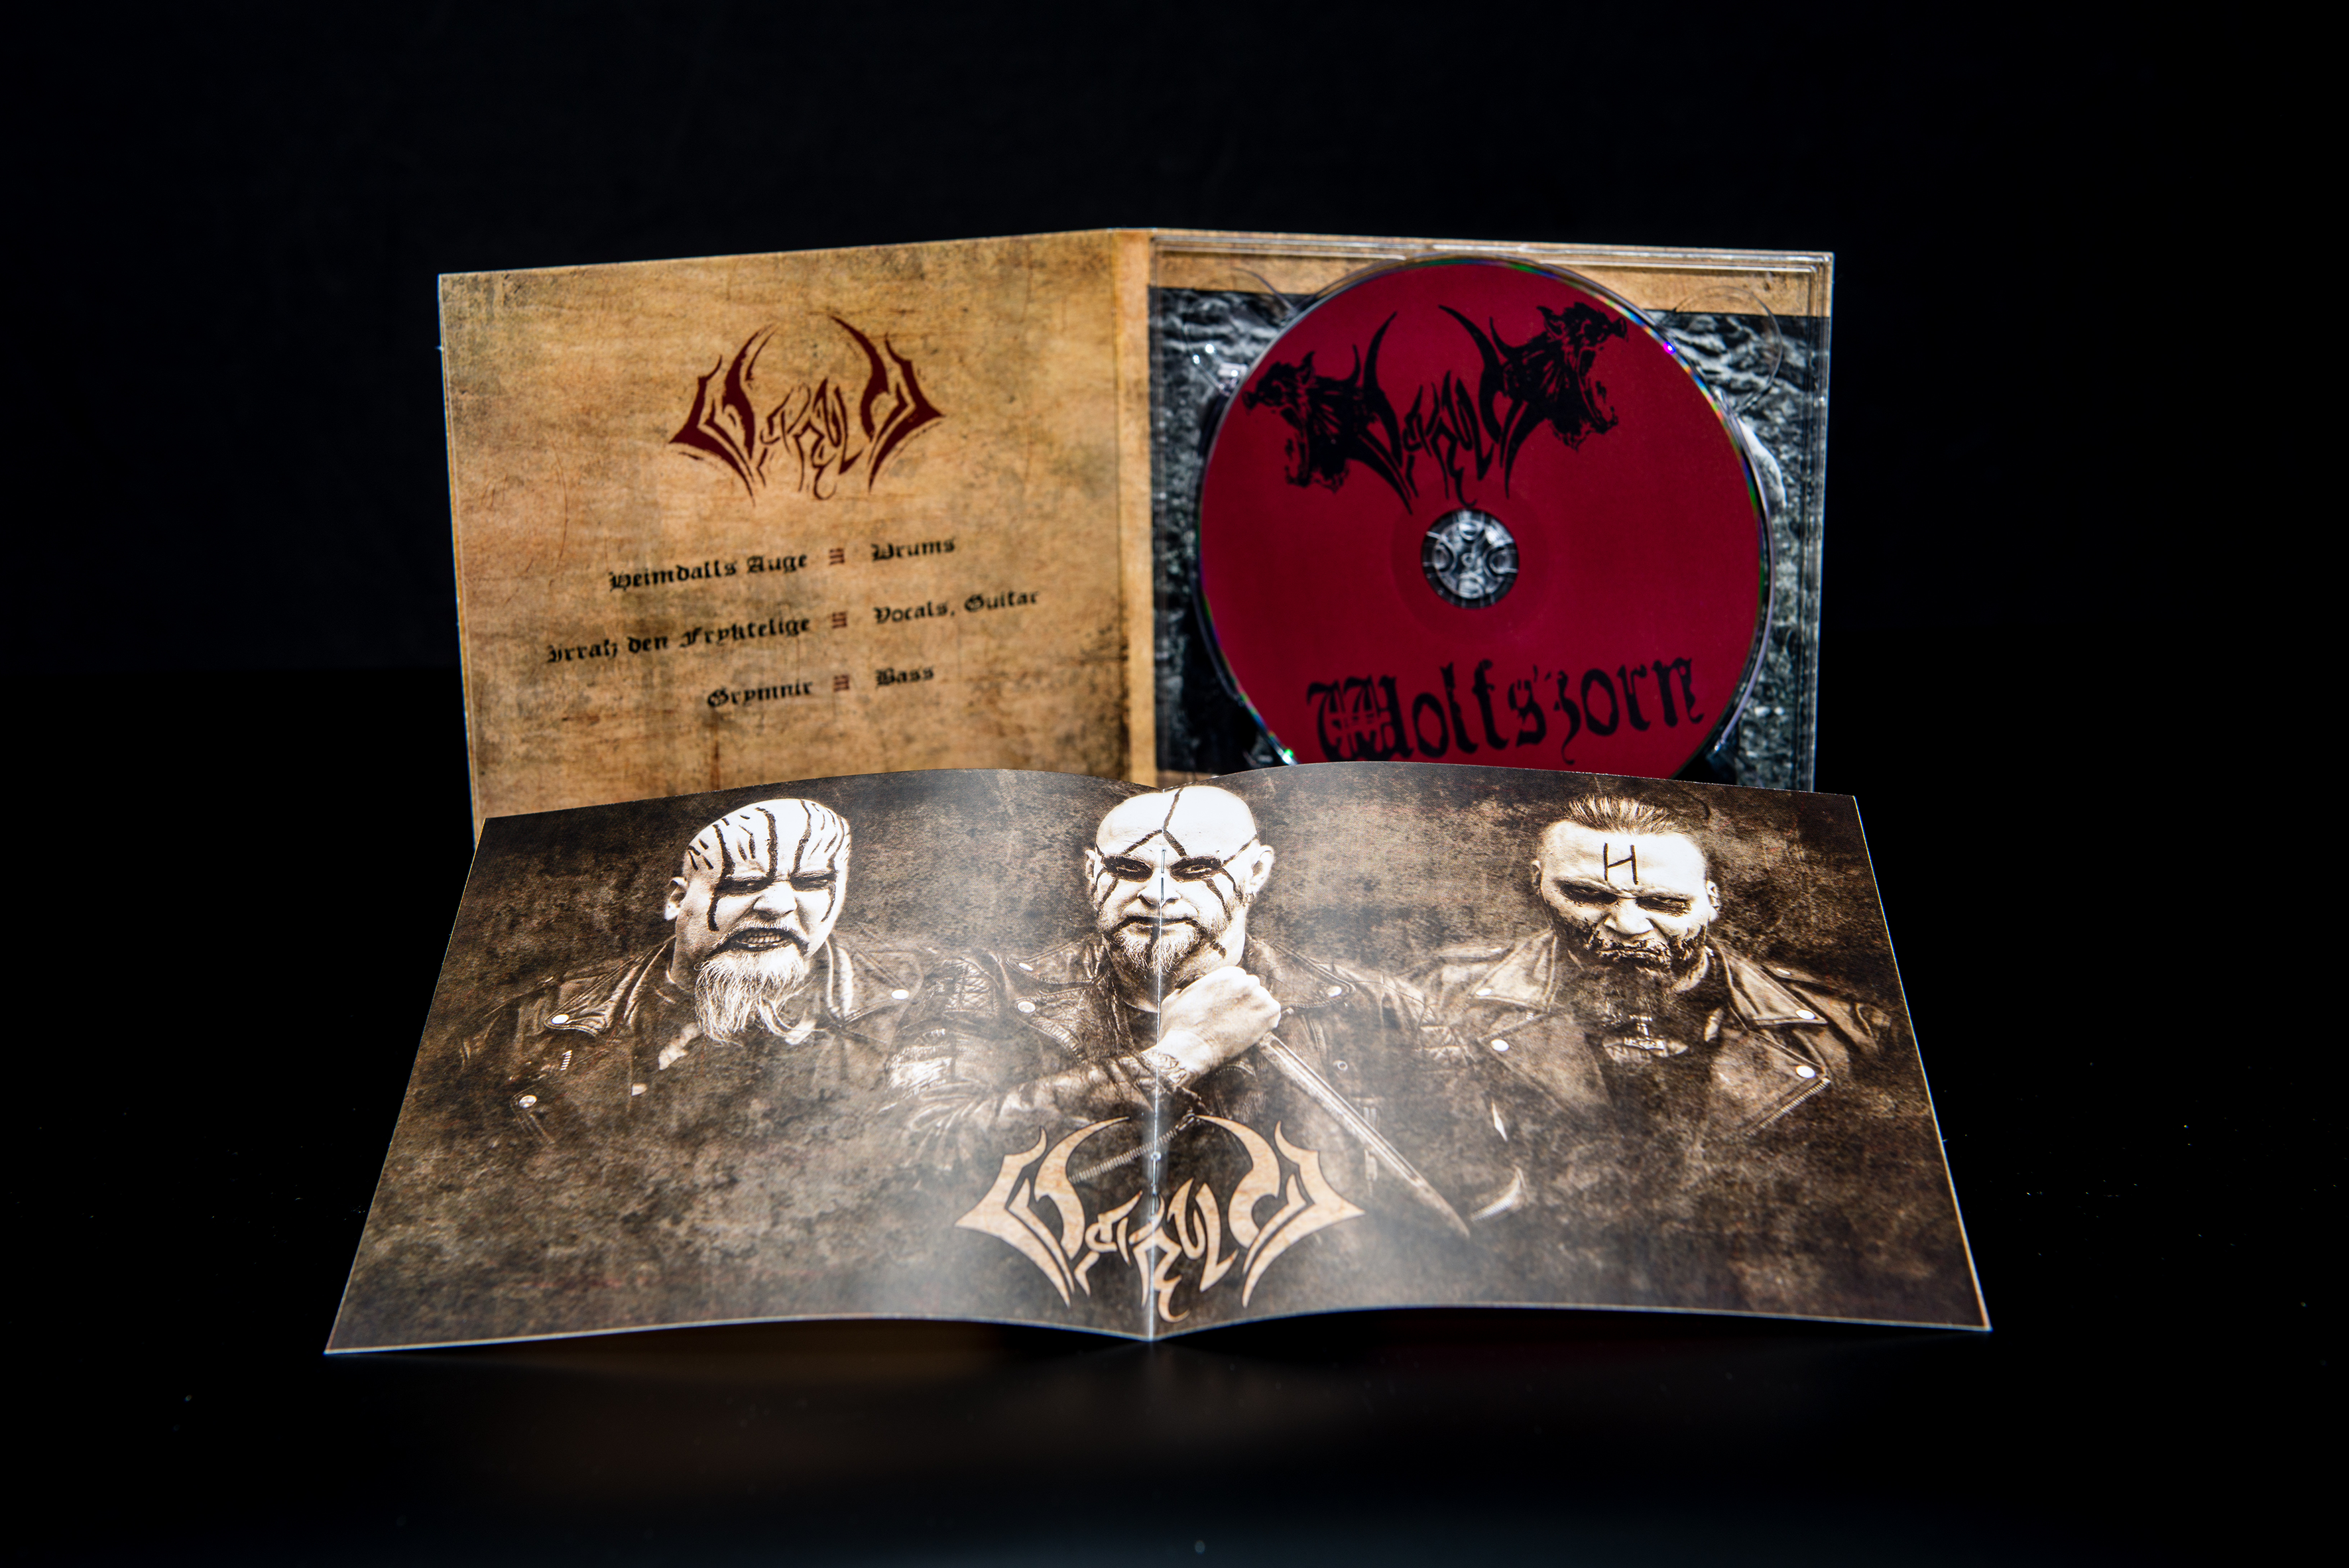 VarulV - Wolfszorn CD Digipack